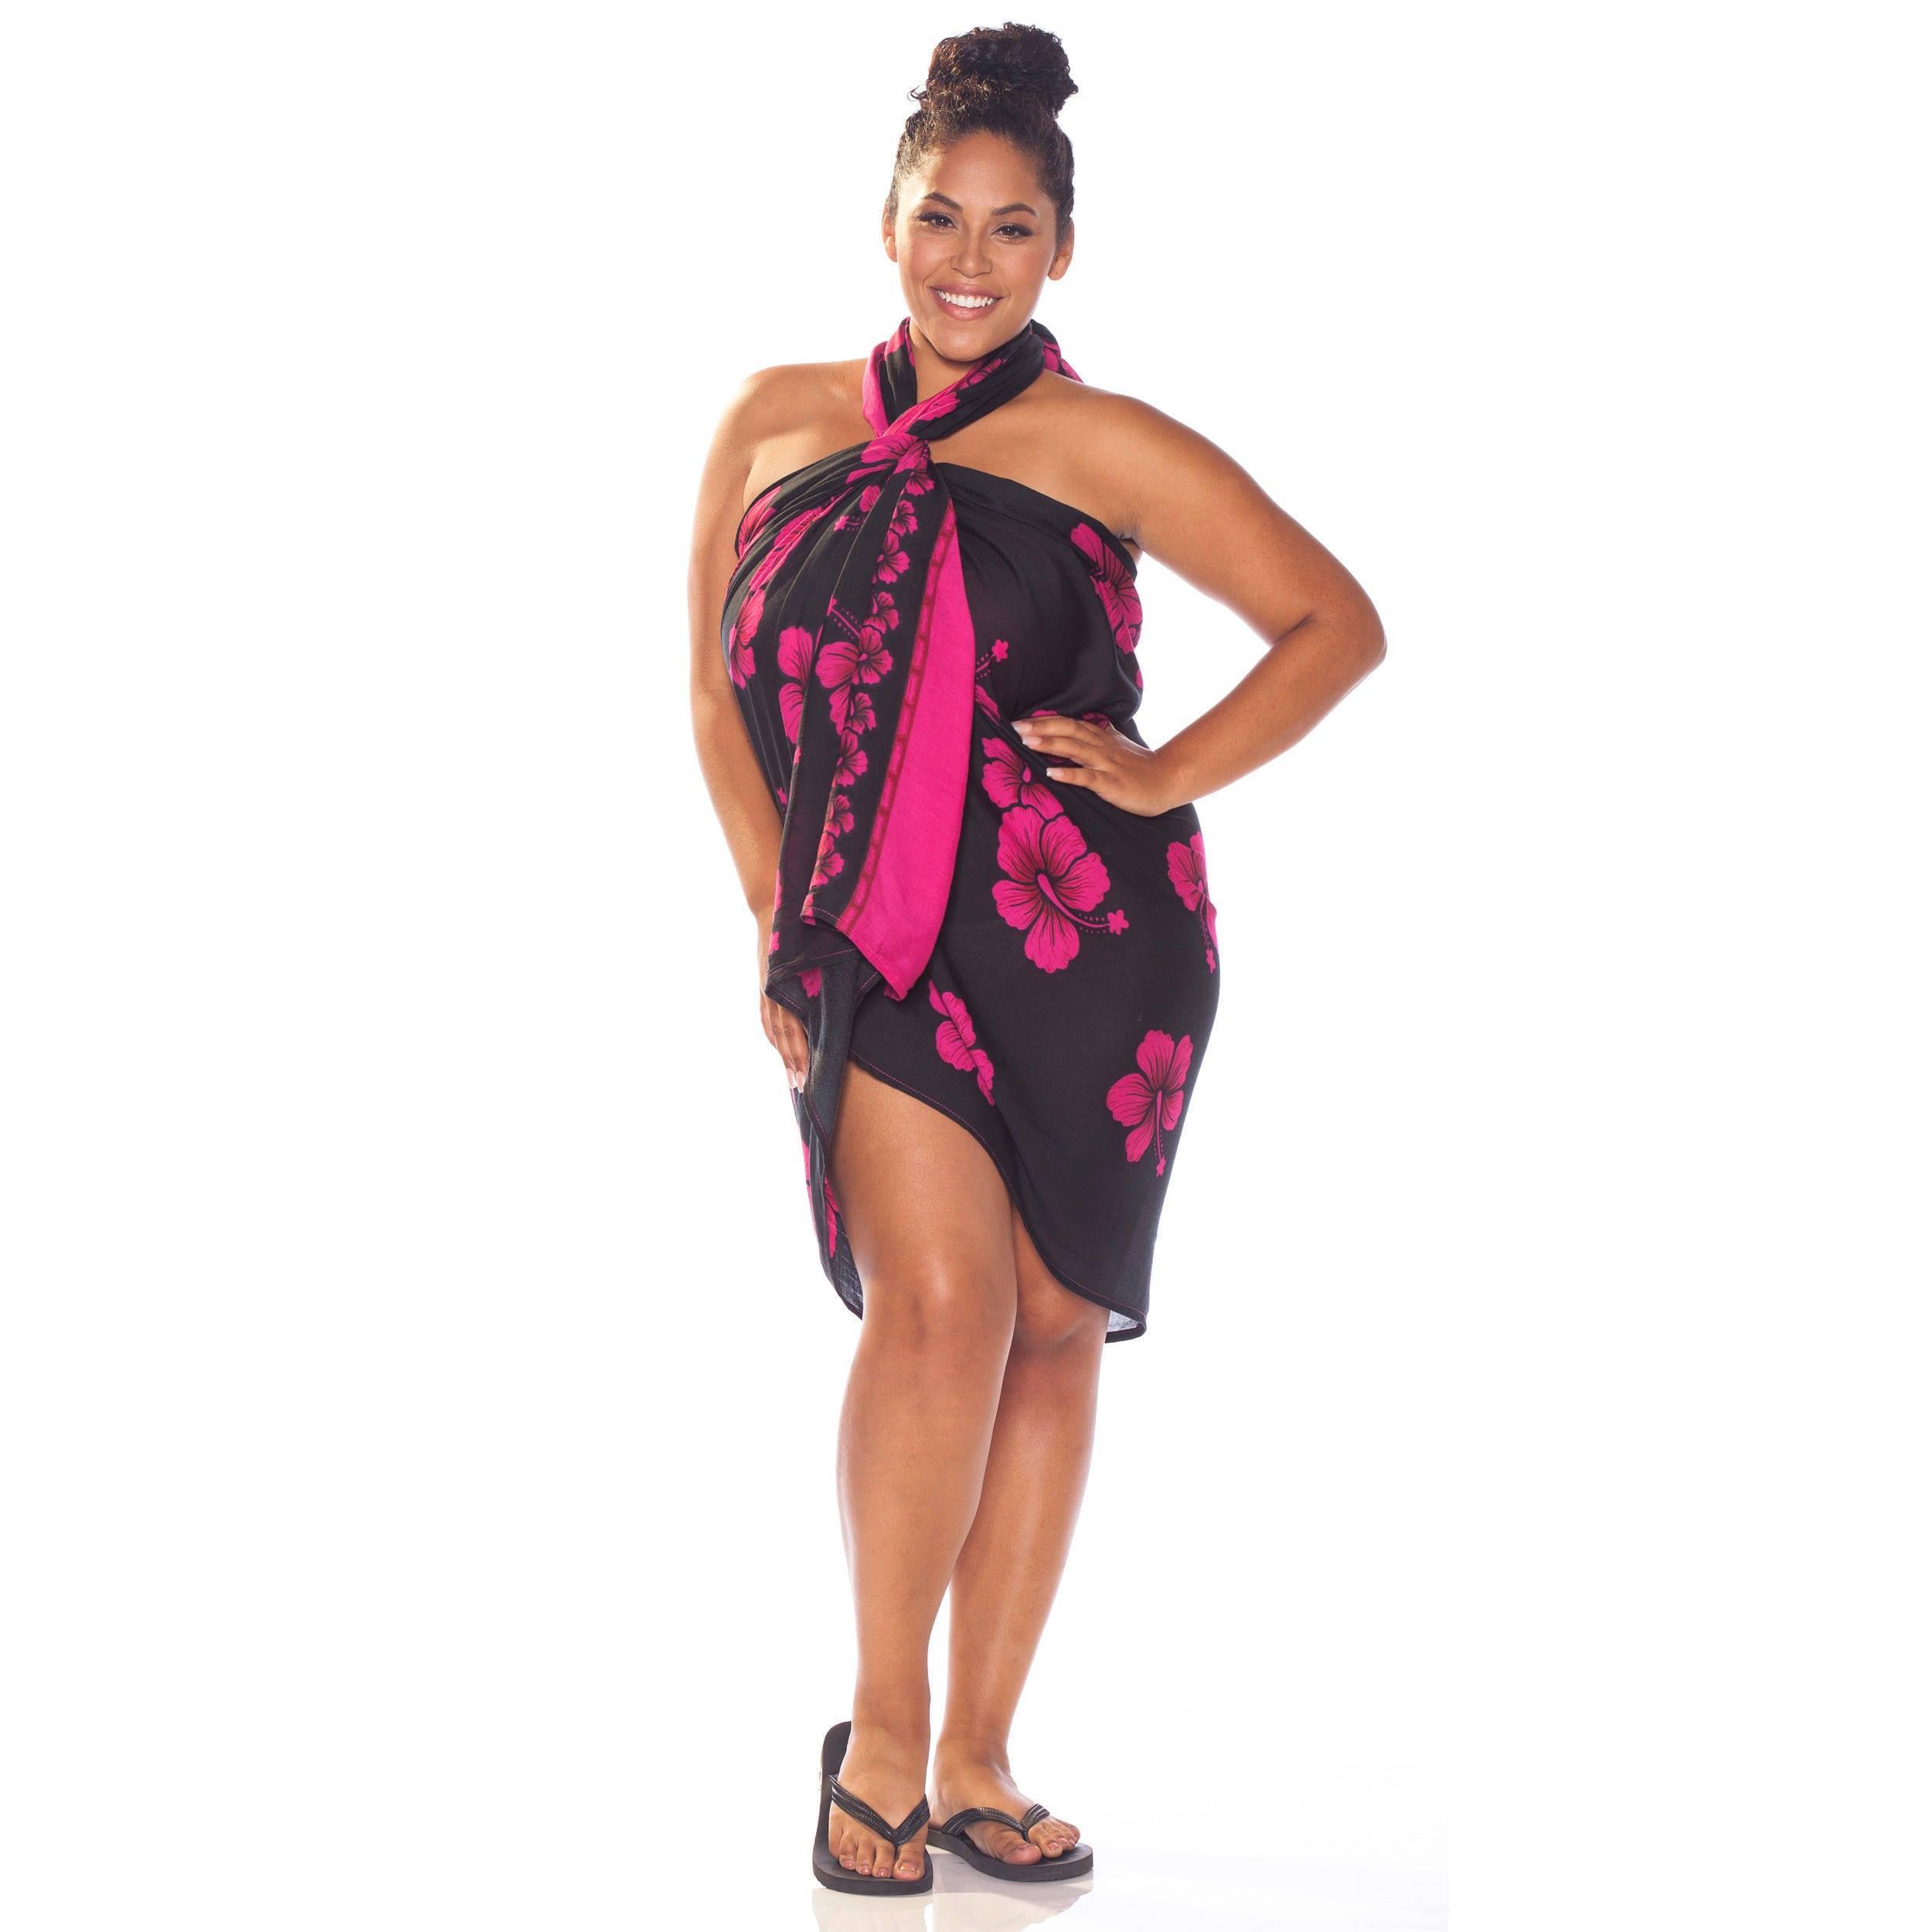 Shop handmade 1 world sarongs womens plus size hibiscus flower shop handmade 1 world sarongs womens plus size hibiscus flower sarong indonesia on sale free shipping on orders over 45 overstock 6193616 izmirmasajfo